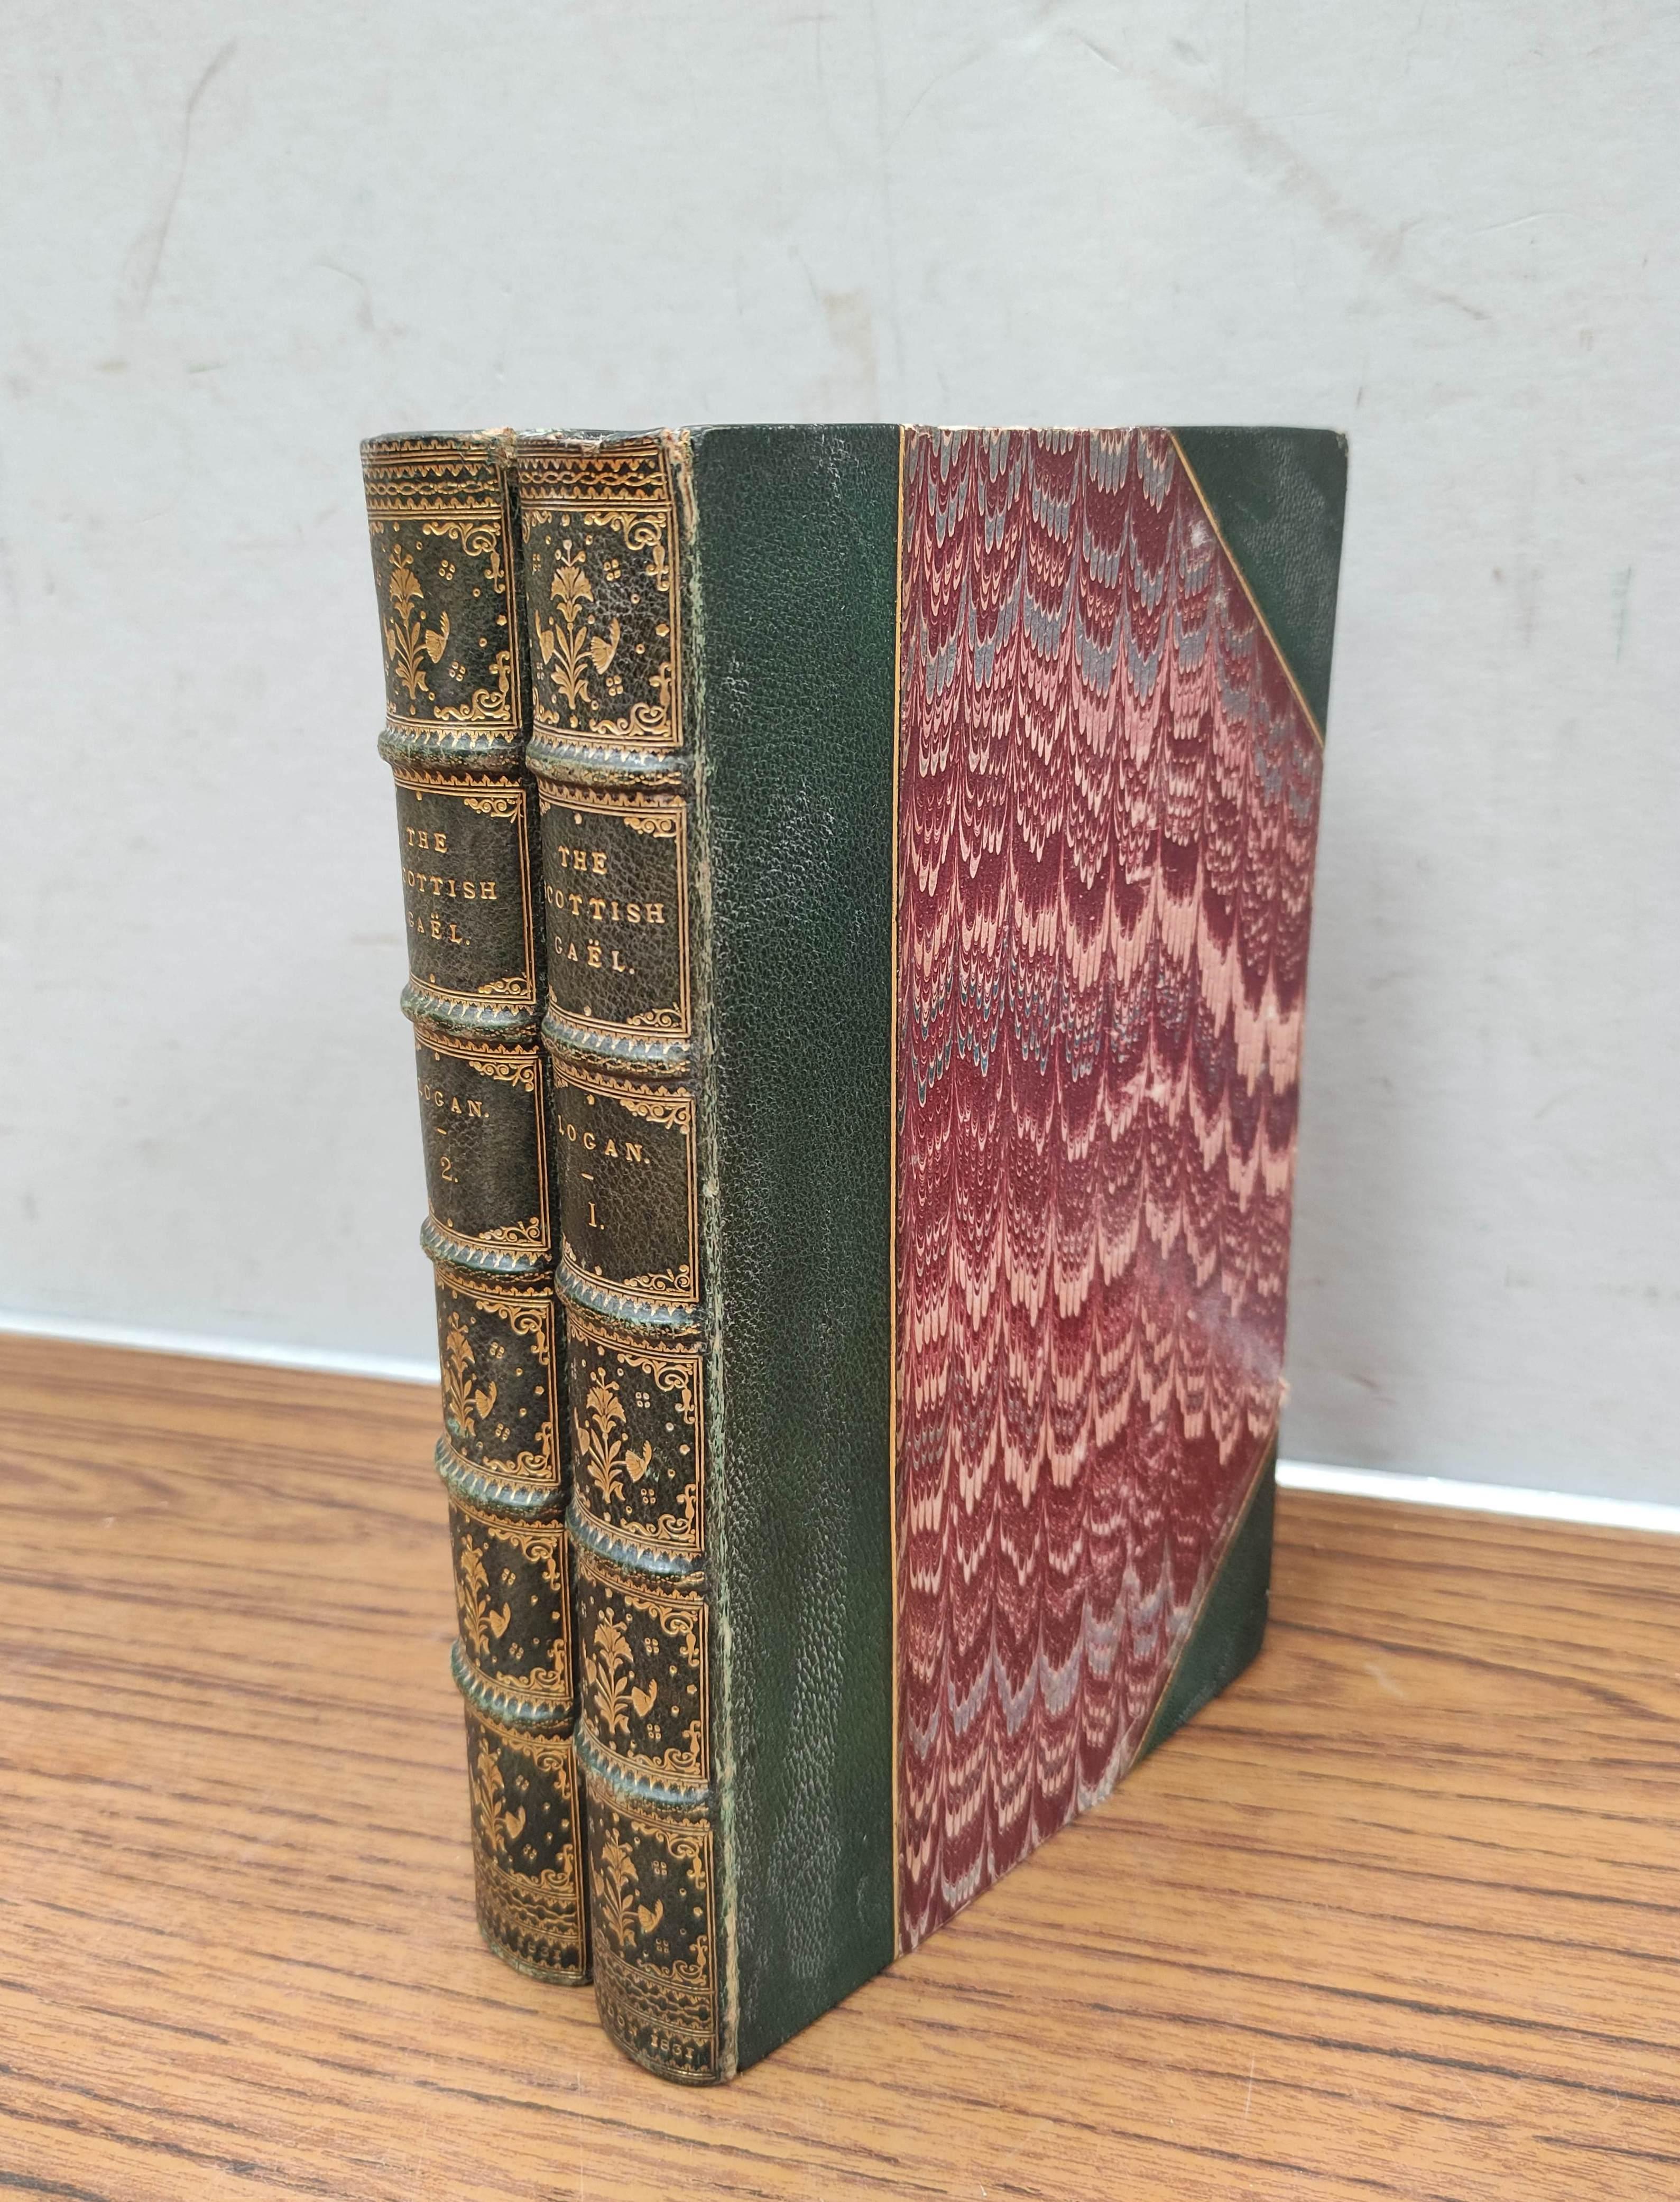 LOGAN JAMES.The Scottish Gael. 2 vols. Col. frontis & text illus. Half green morocco. A nice